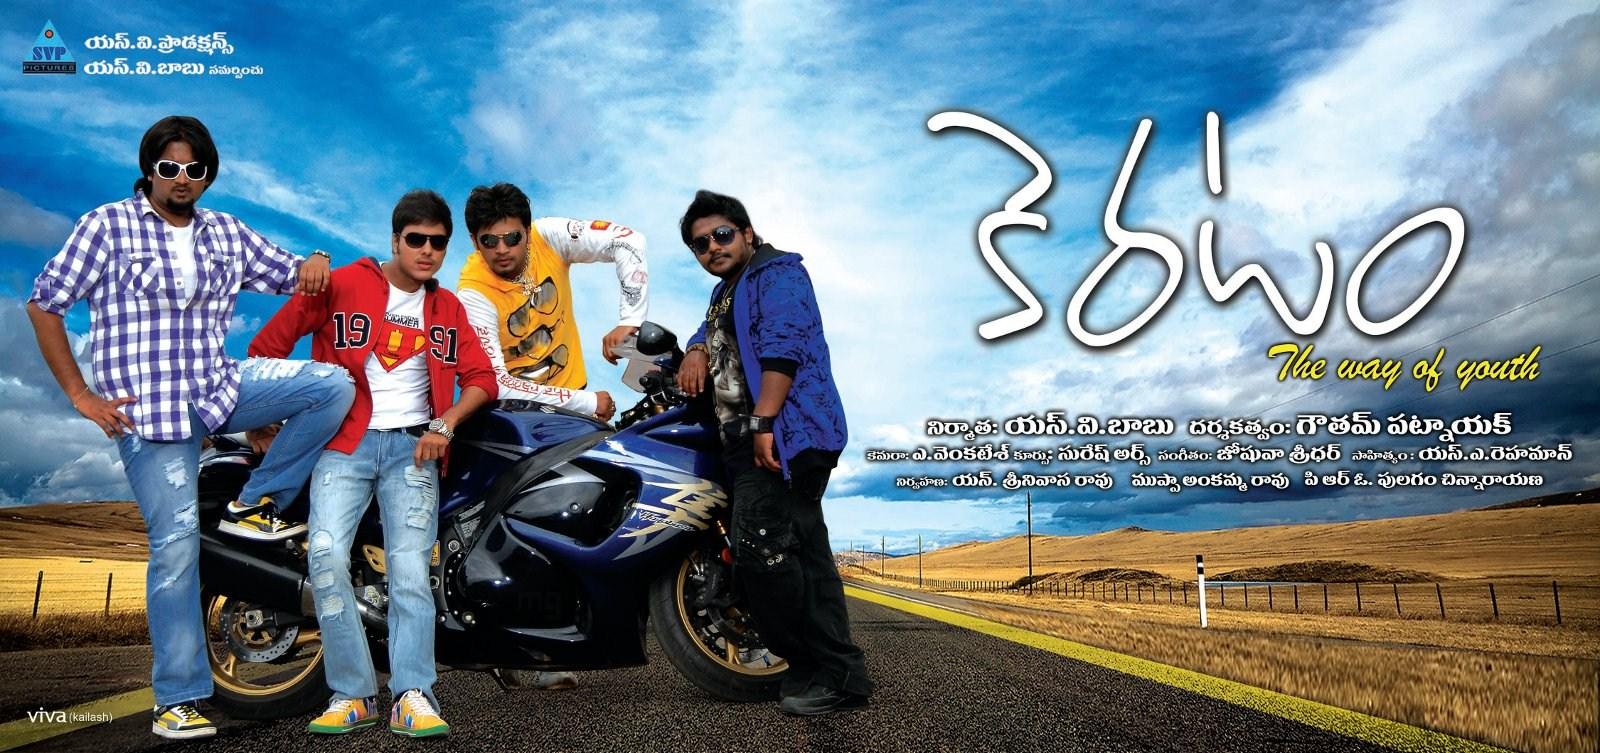 keratam 2011 telugu movie watch online